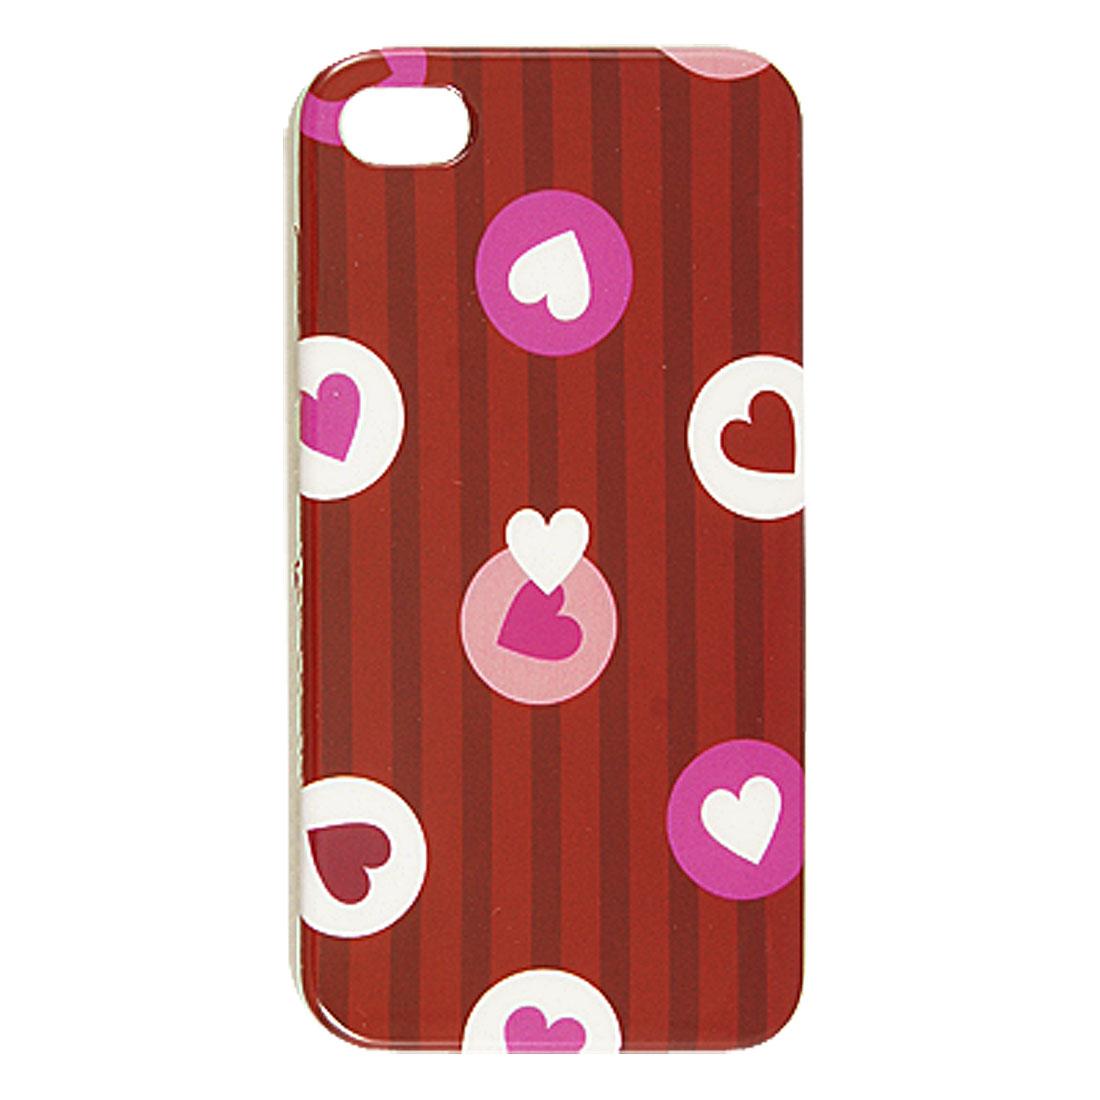 Heart Shape Pattern Red Hard Plastic IMD Back Case for iPhone 4 4G 4S